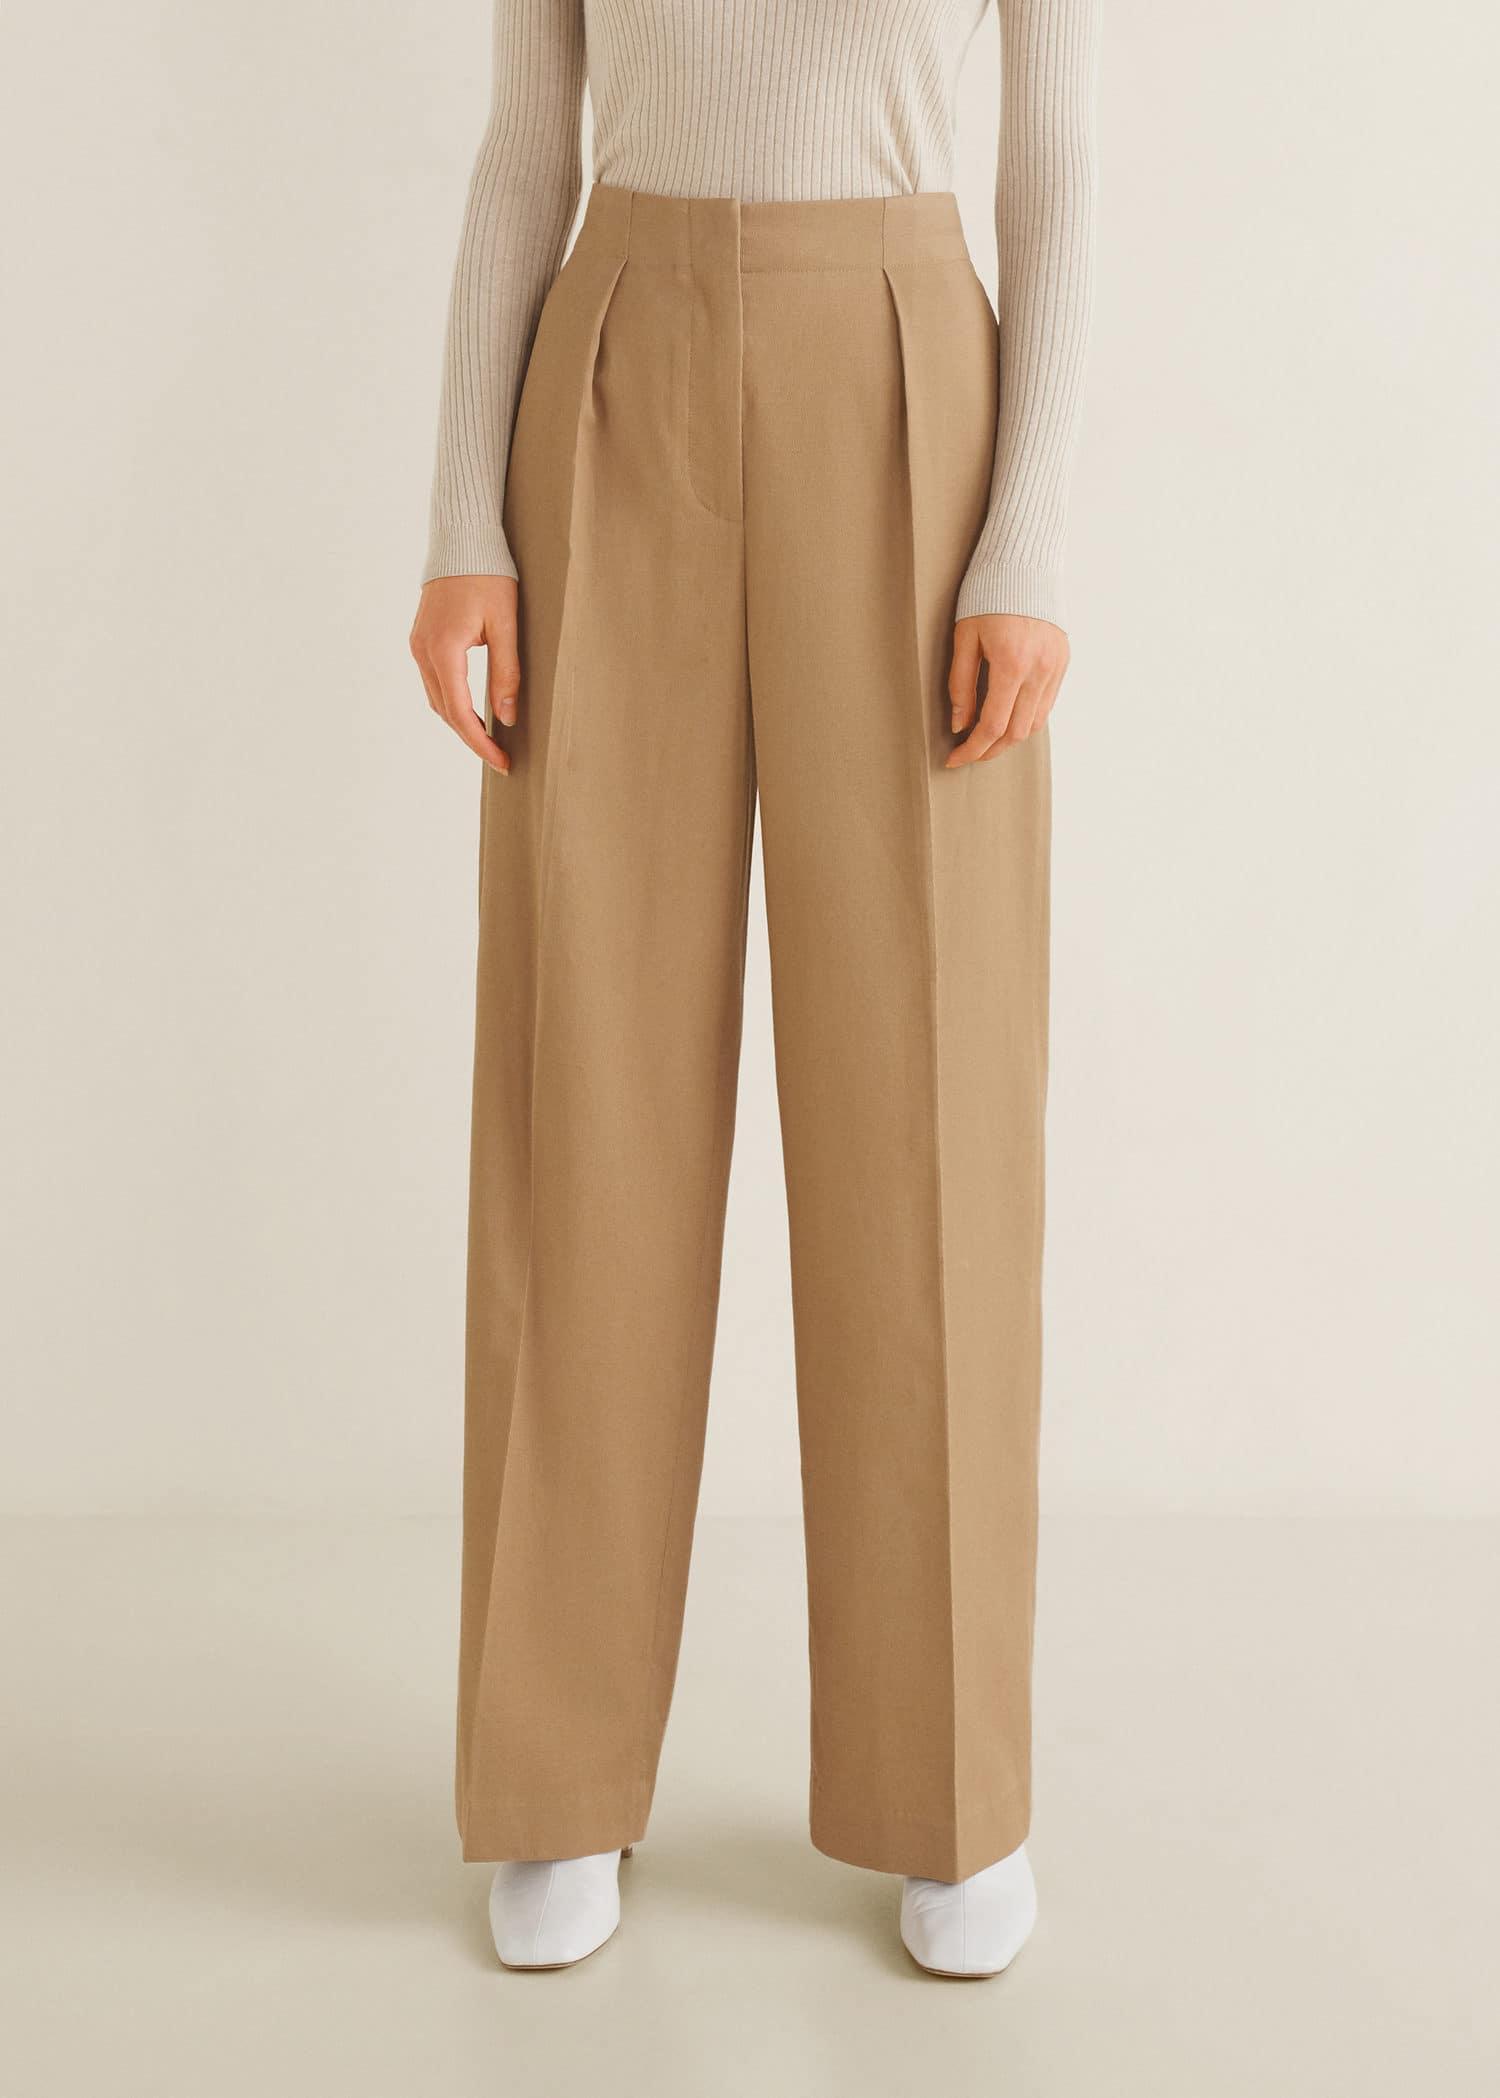 Tissu De La Reunion pantalon tissu soft - femme | mango france (la réunion)